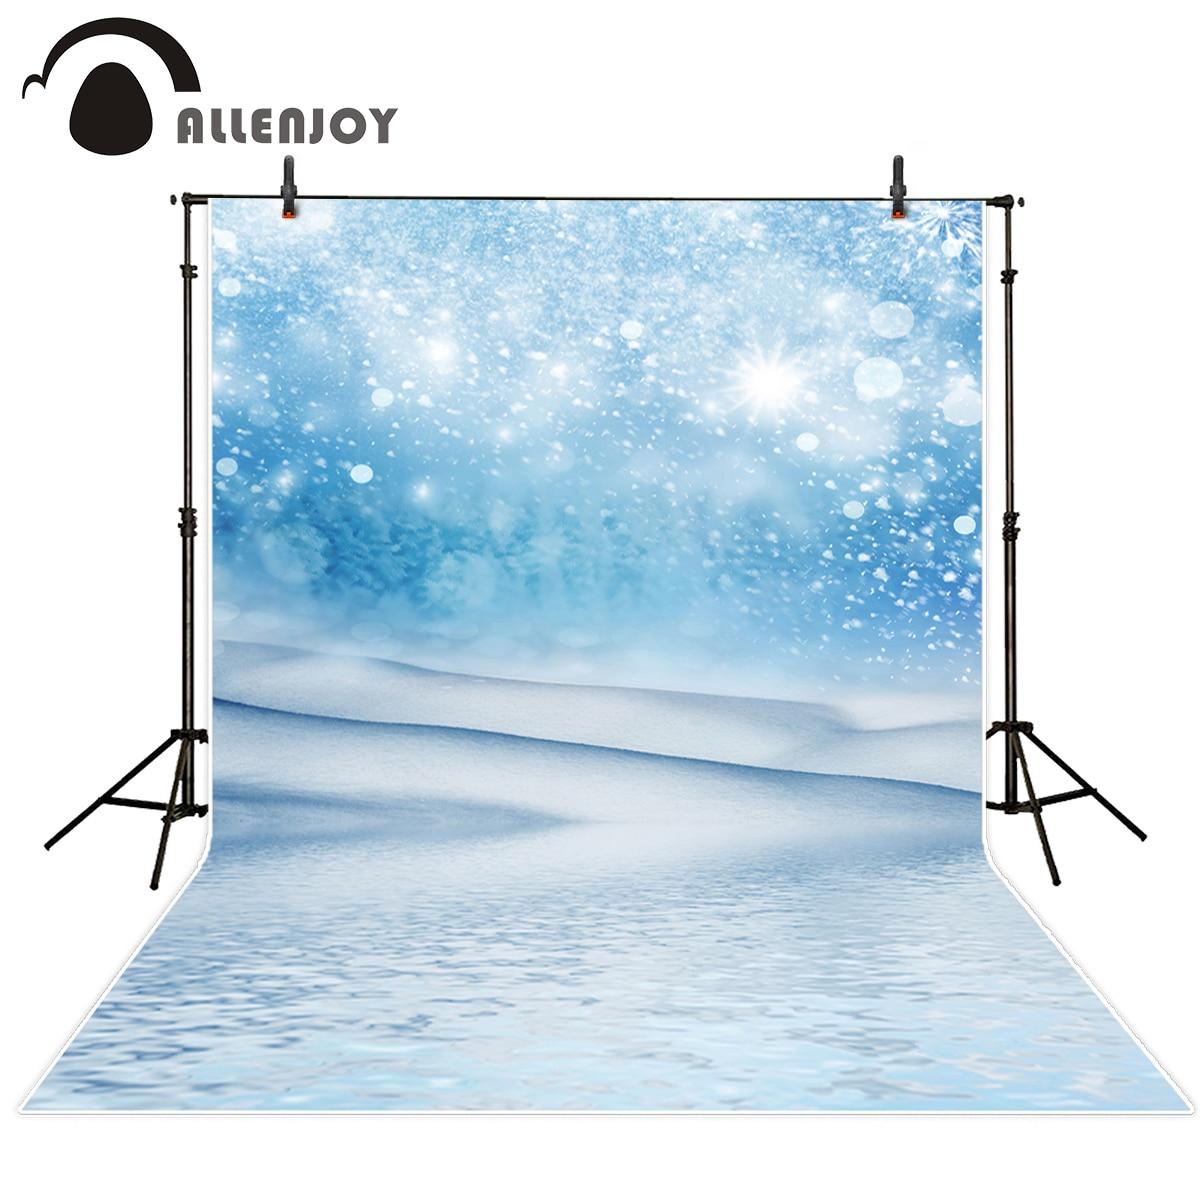 Allenjoy photography background snow winter wihte shiny bokeh photo backdrop vinyl photo backdrop photography backdrop vinyl